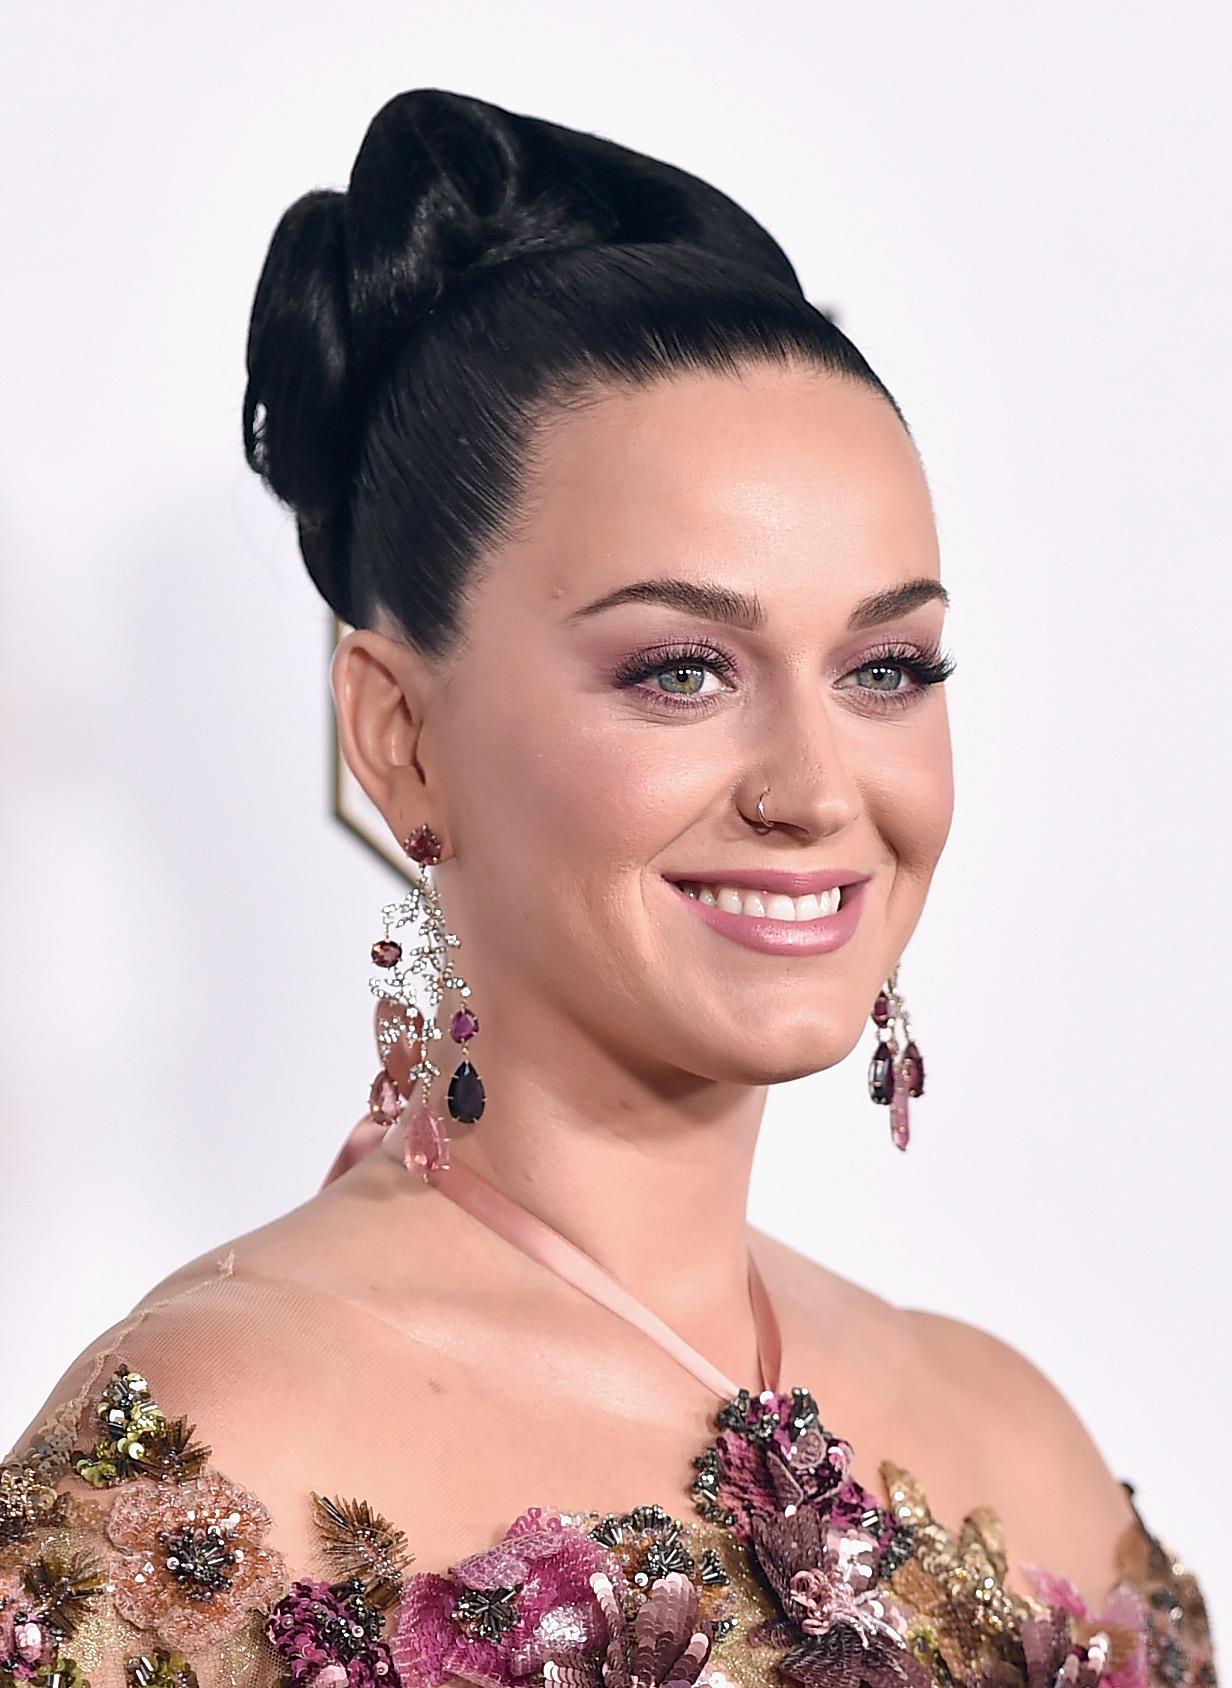 Katy Perry vuelve a meterse con Taylor Swift: le 'roba' a sus productores